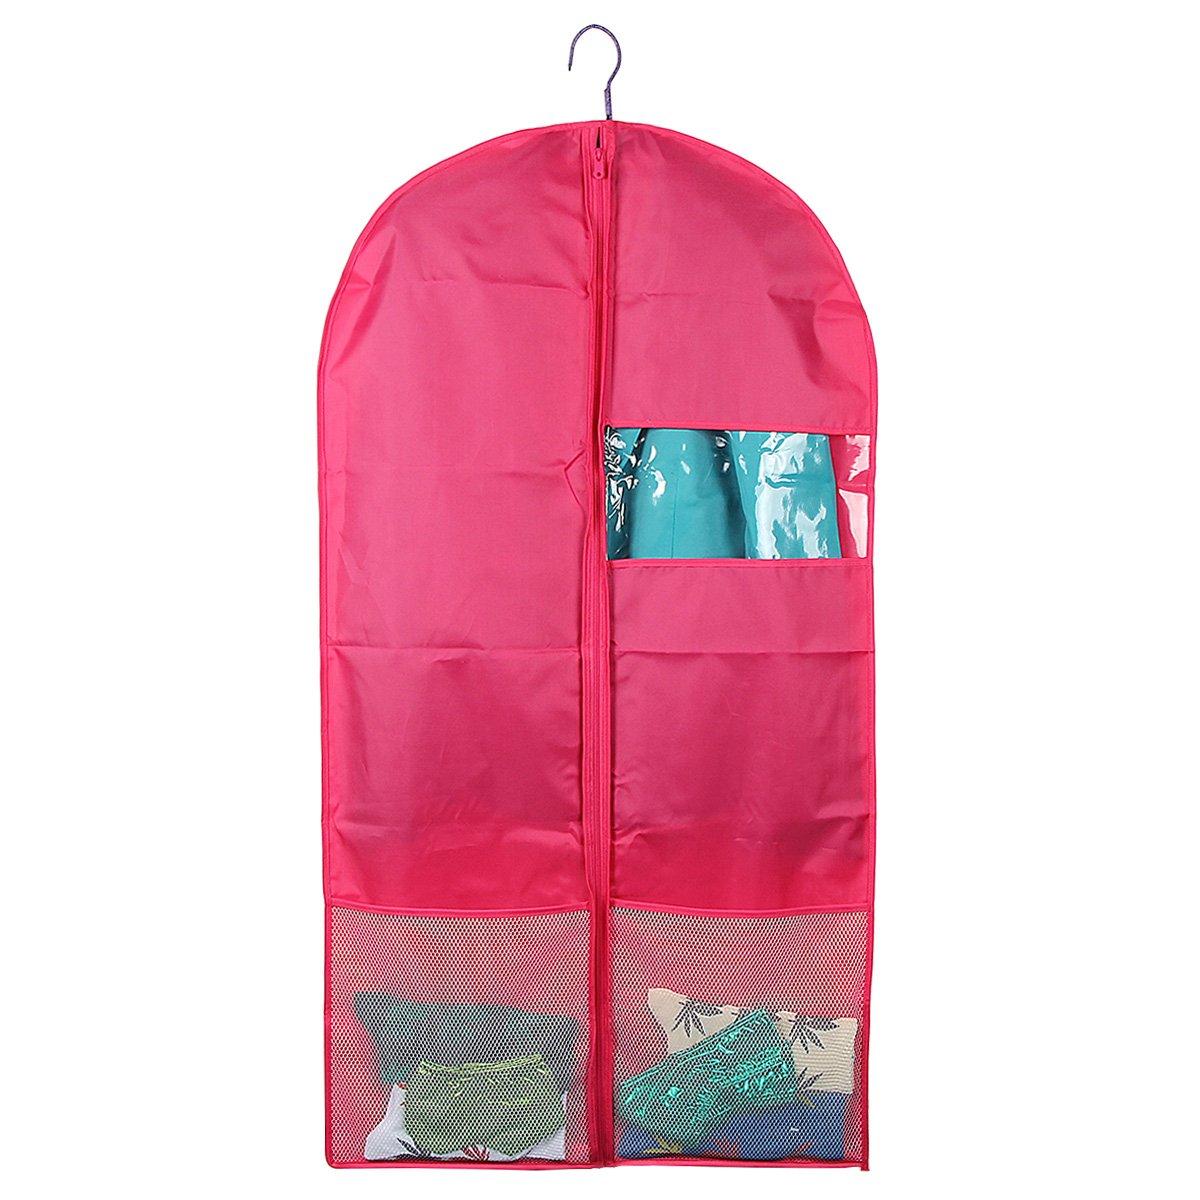 Cheap Retail Garment Bags, find Retail Garment Bags deals on line at ...